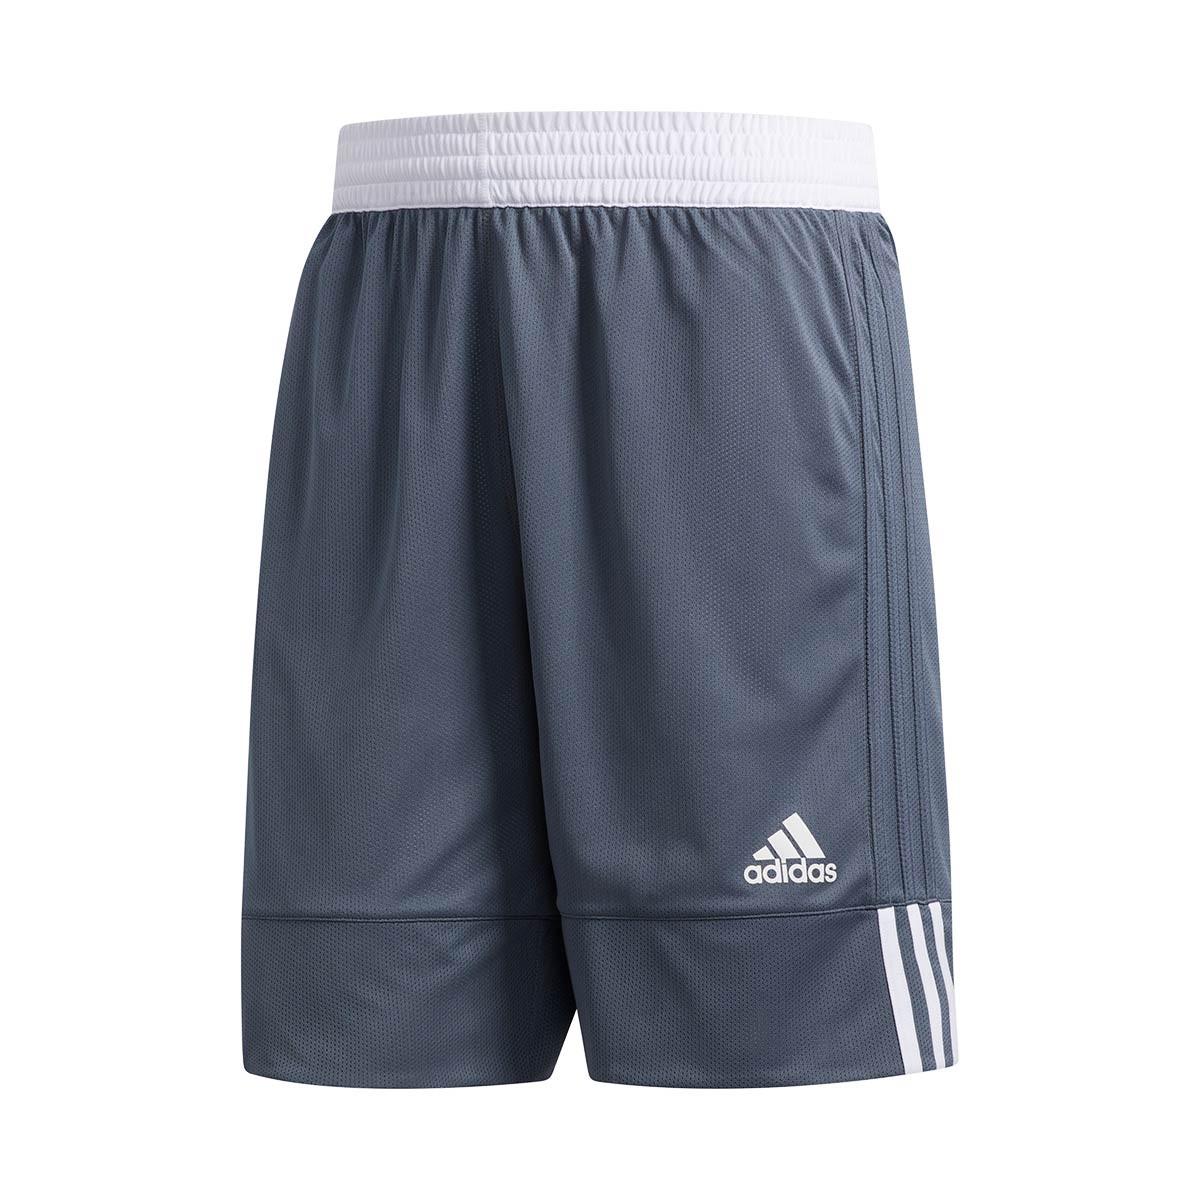 ala Tamano relativo Subdividir  Shorts adidas 3G Speed Reverse Onix-White - Football store Fútbol Emotion